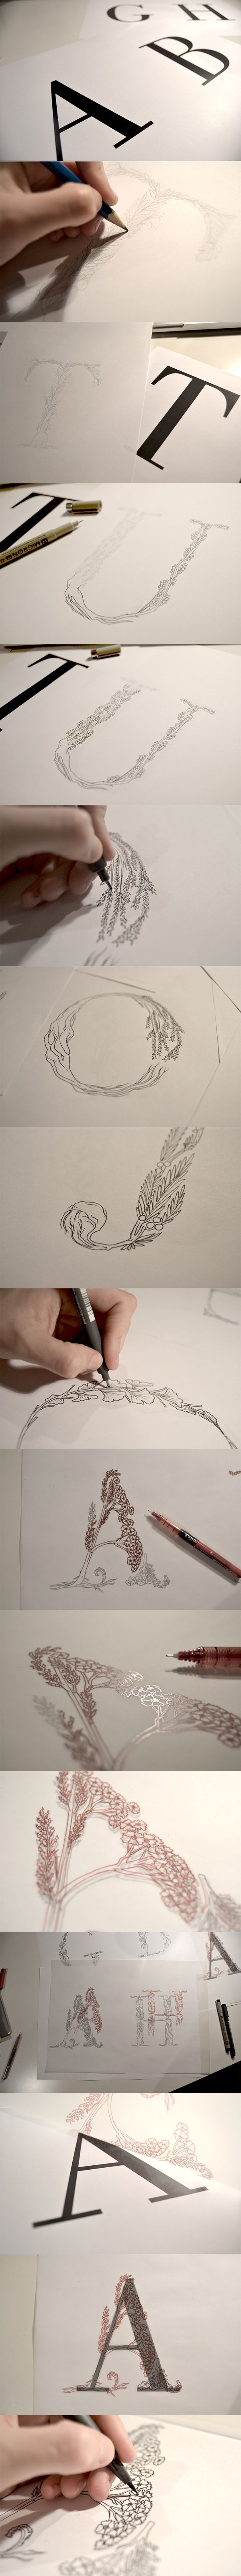 Process. Herbarium Typography // Ana Bangueses